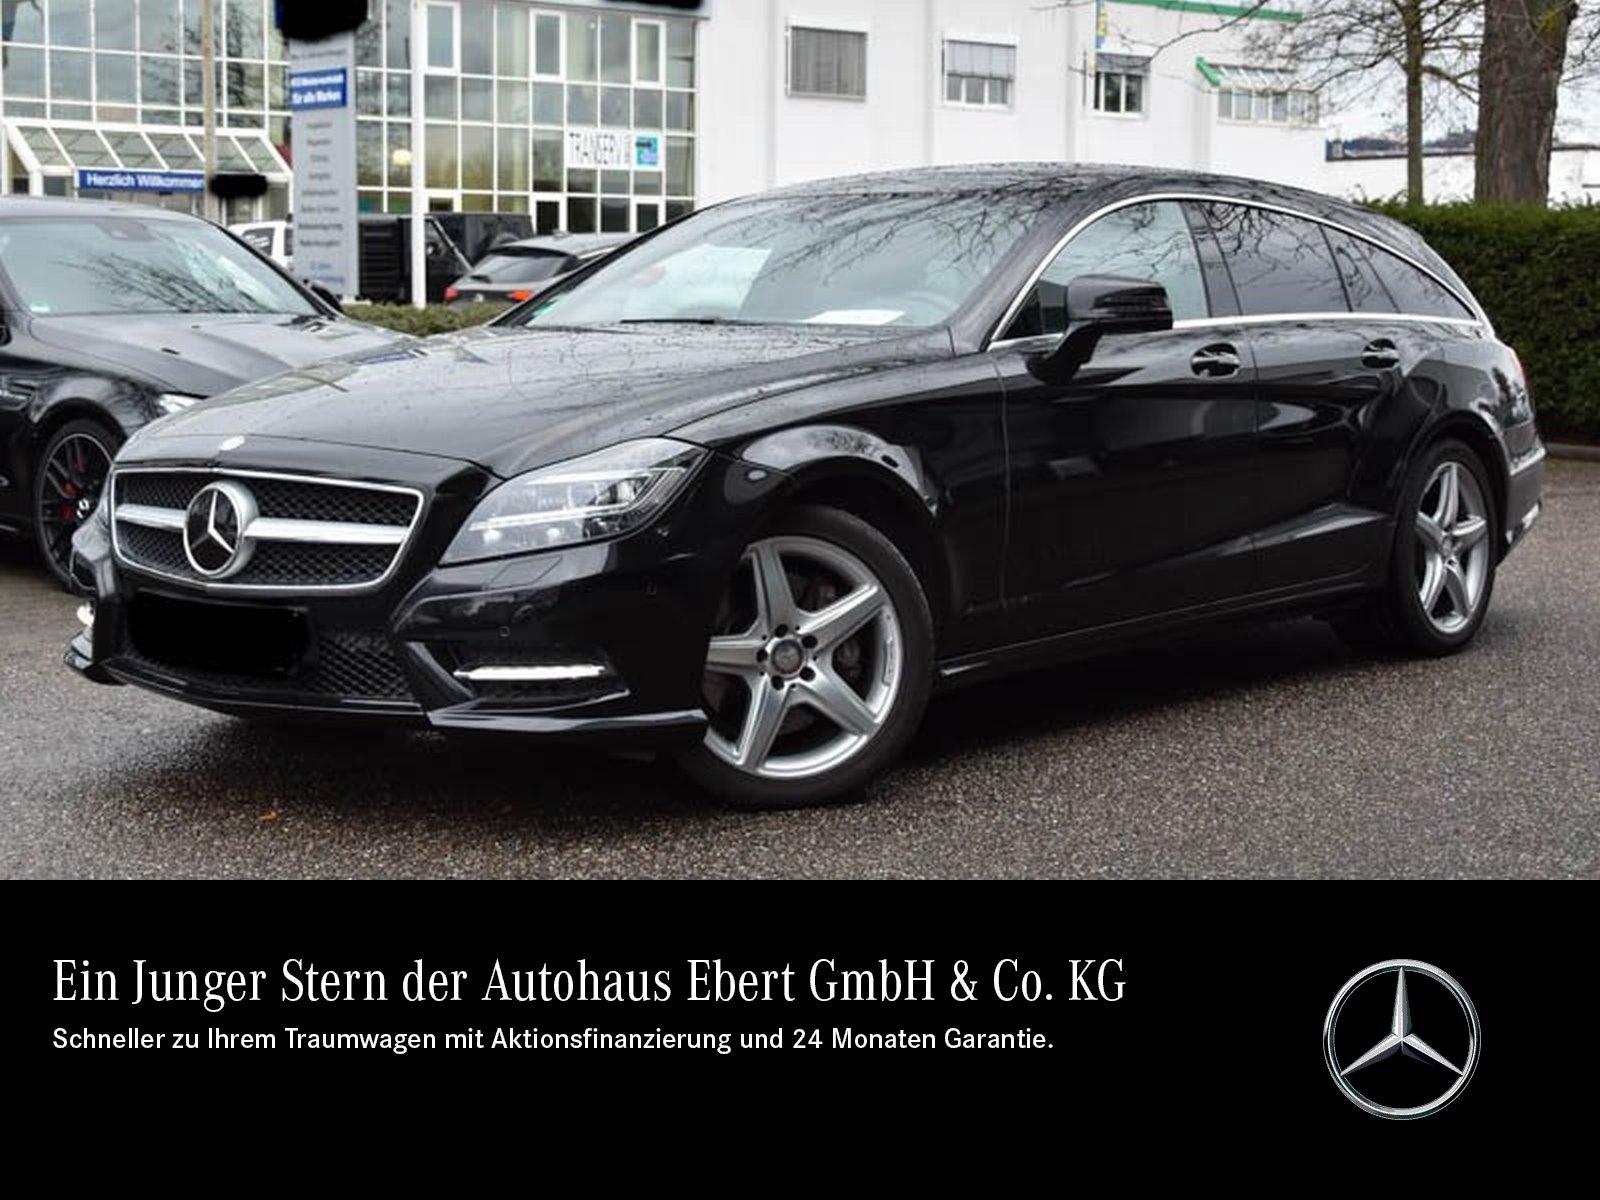 Mercedes-Benz CLS 350 CDI SB AMG COMAND+RFK+BURM+LED+DISTRONIC, Jahr 2014, Diesel